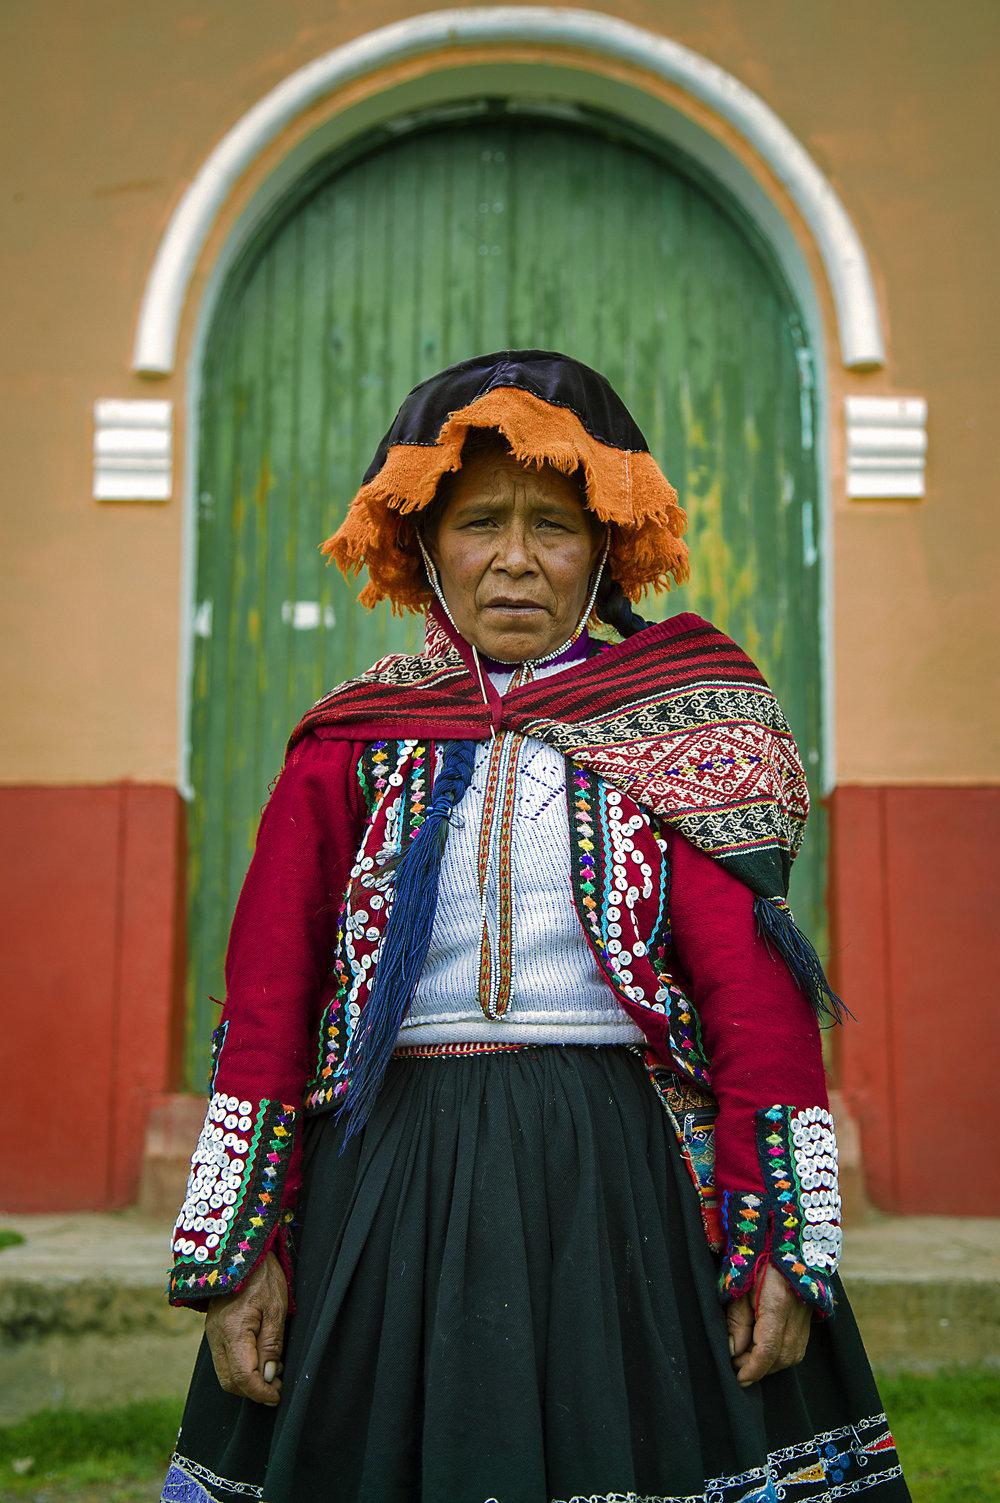 Simon+Needham+Humanitarian+Photography+Peru+16.jpg